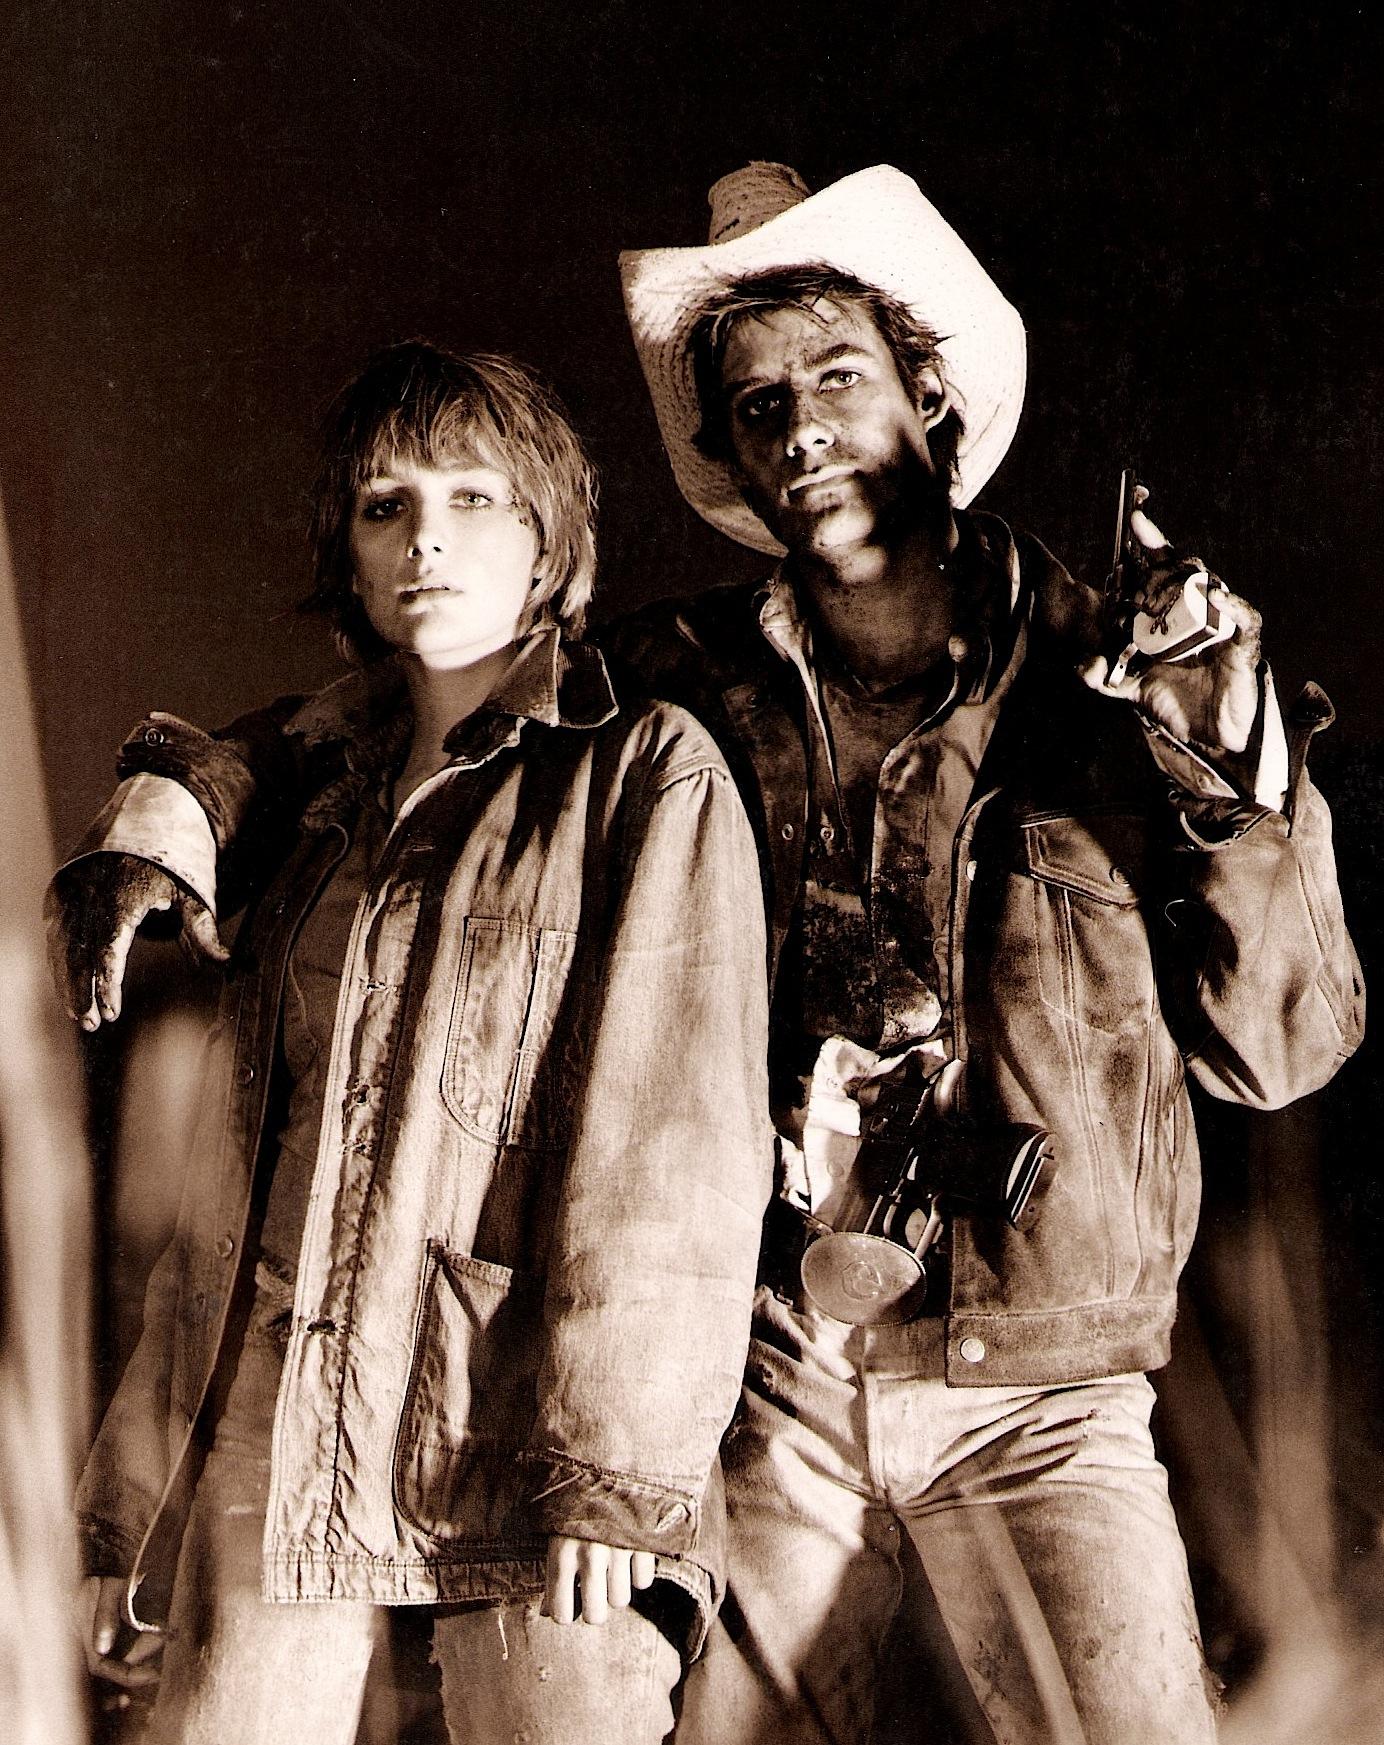 Adrian Pasdar and Jenny Wright in Near Dark (1987)